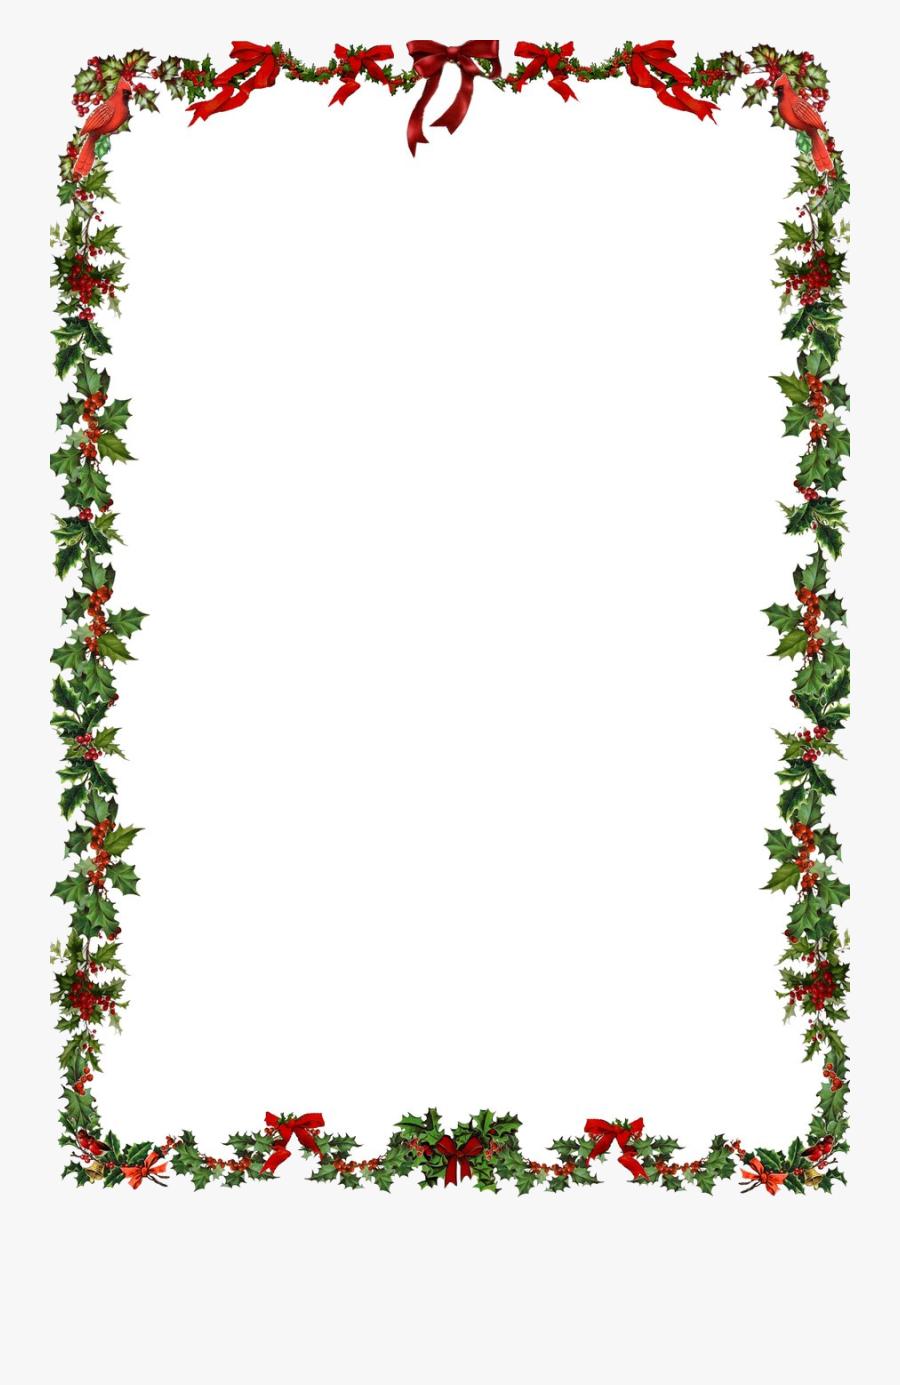 Christmas Border Free Xmas Cliparts Borders Clip Art - Frame Christmas Png, Transparent Clipart